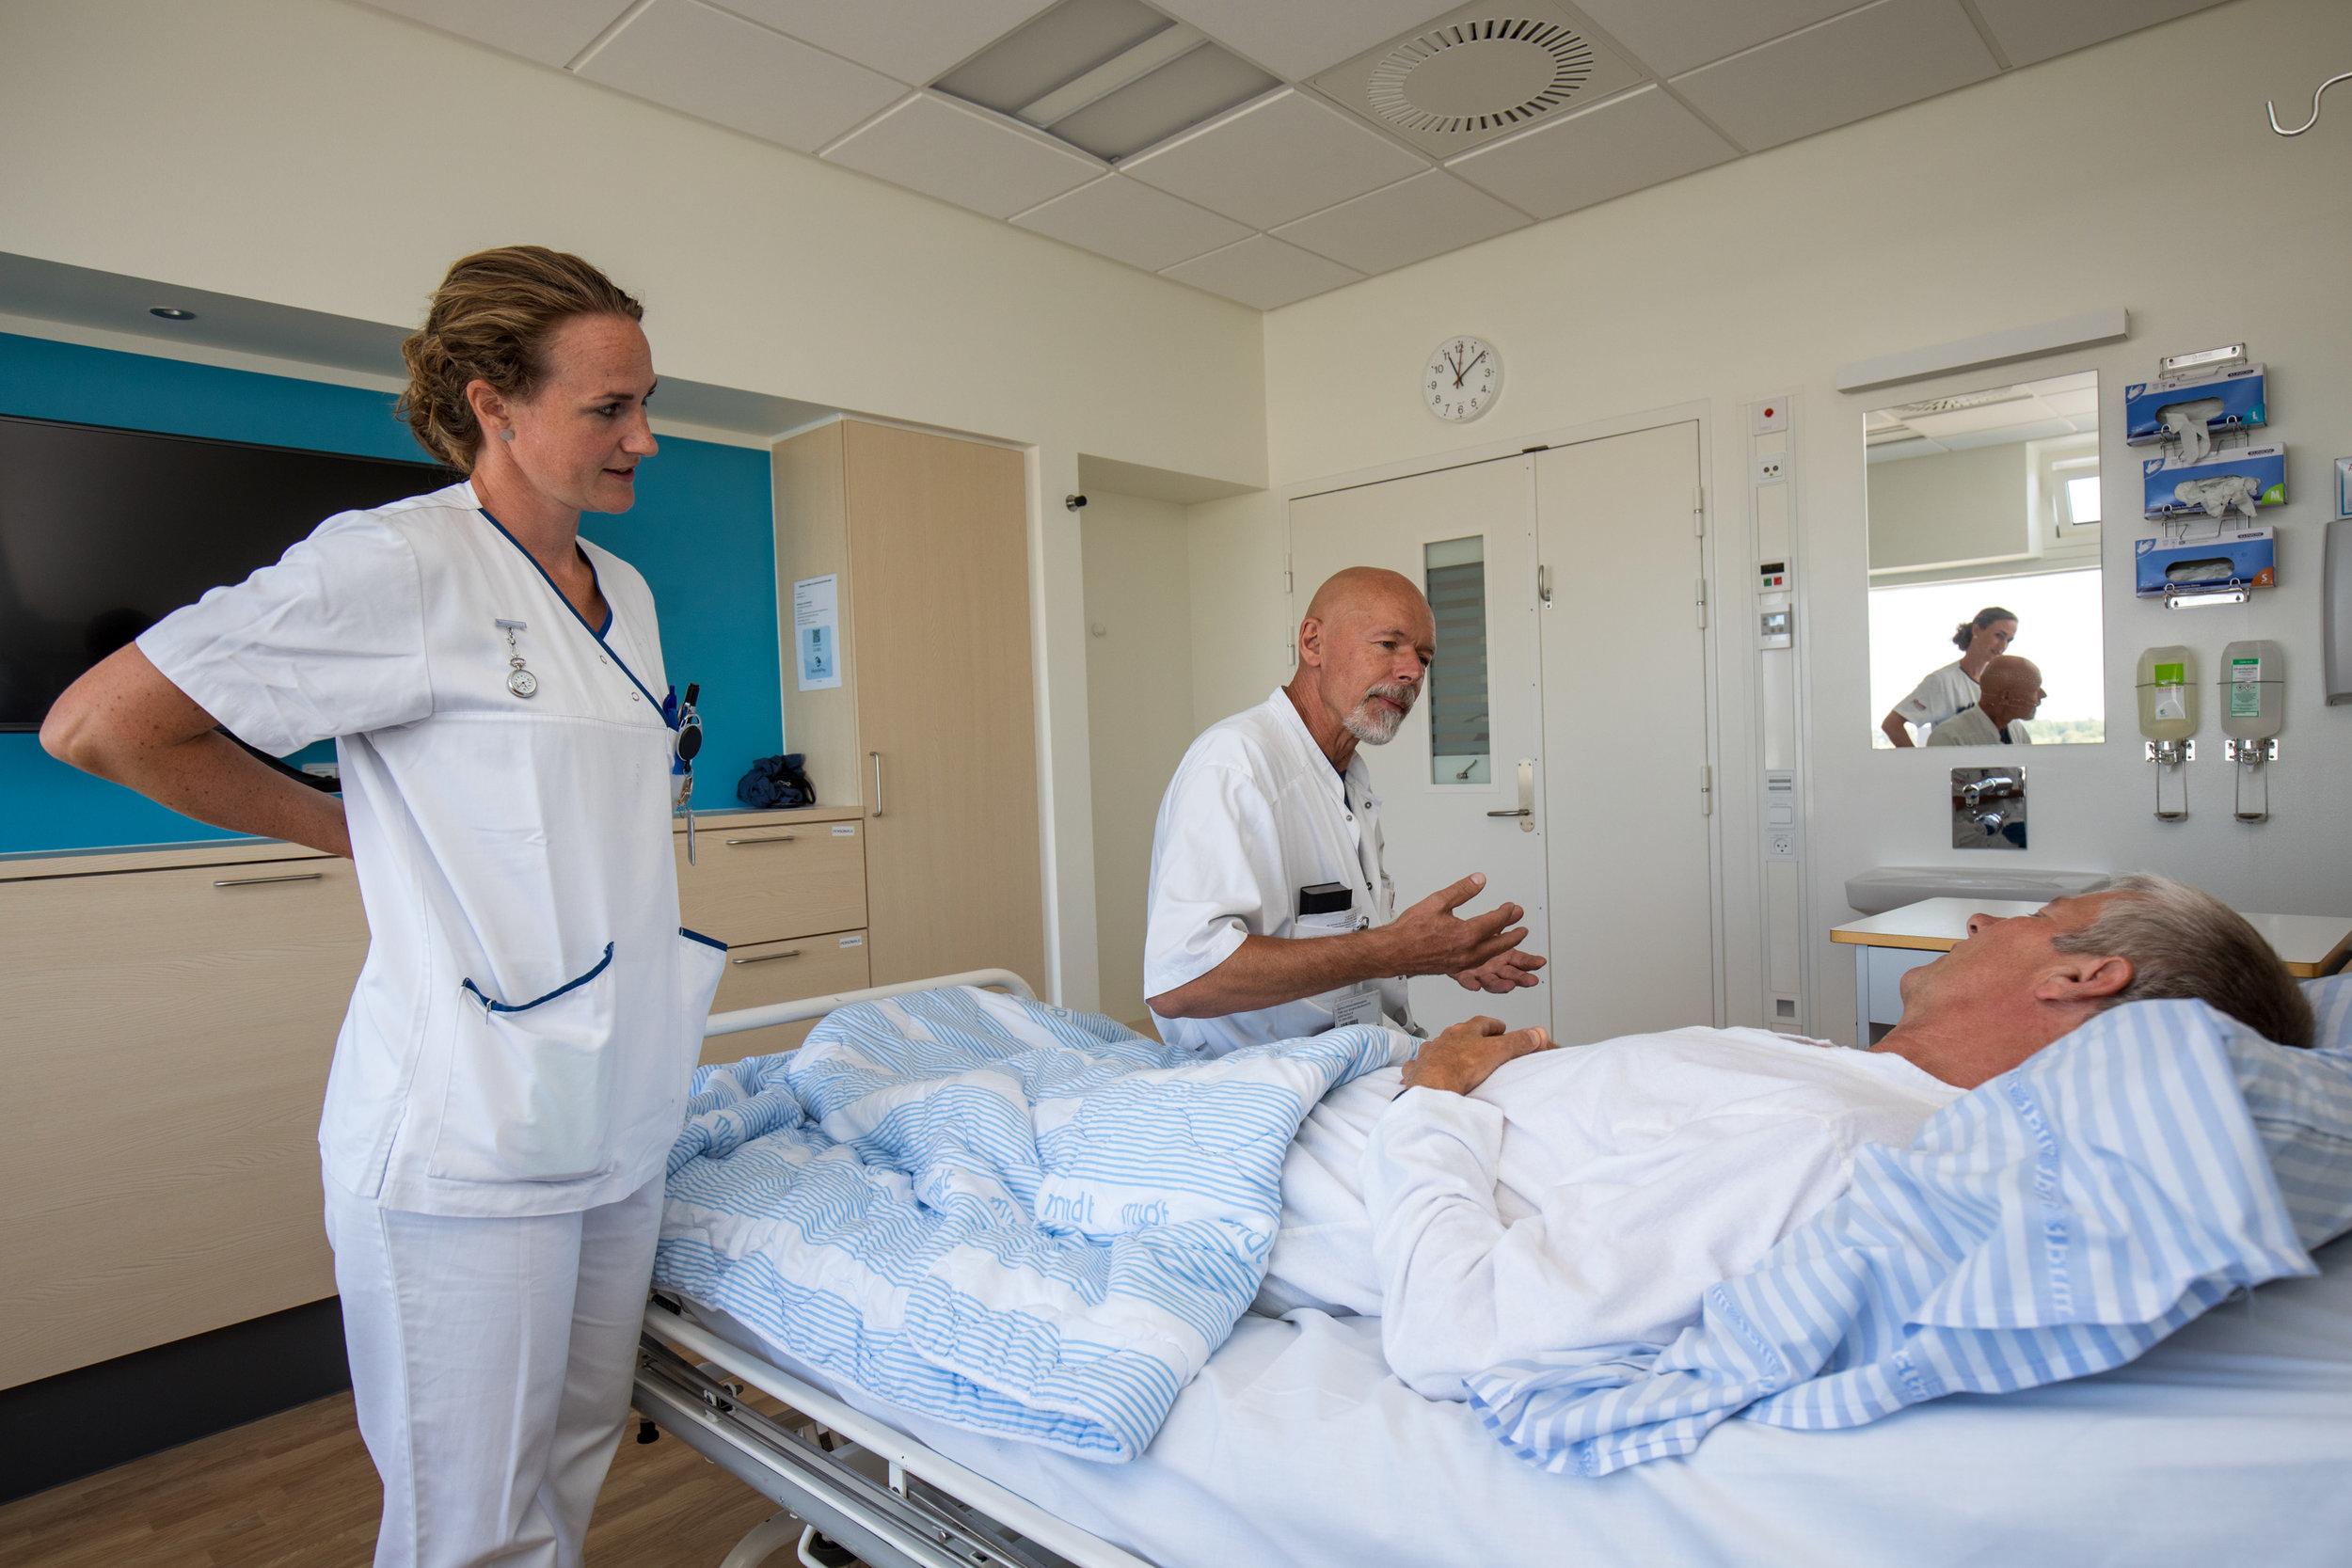 sygeplejerske.jpg